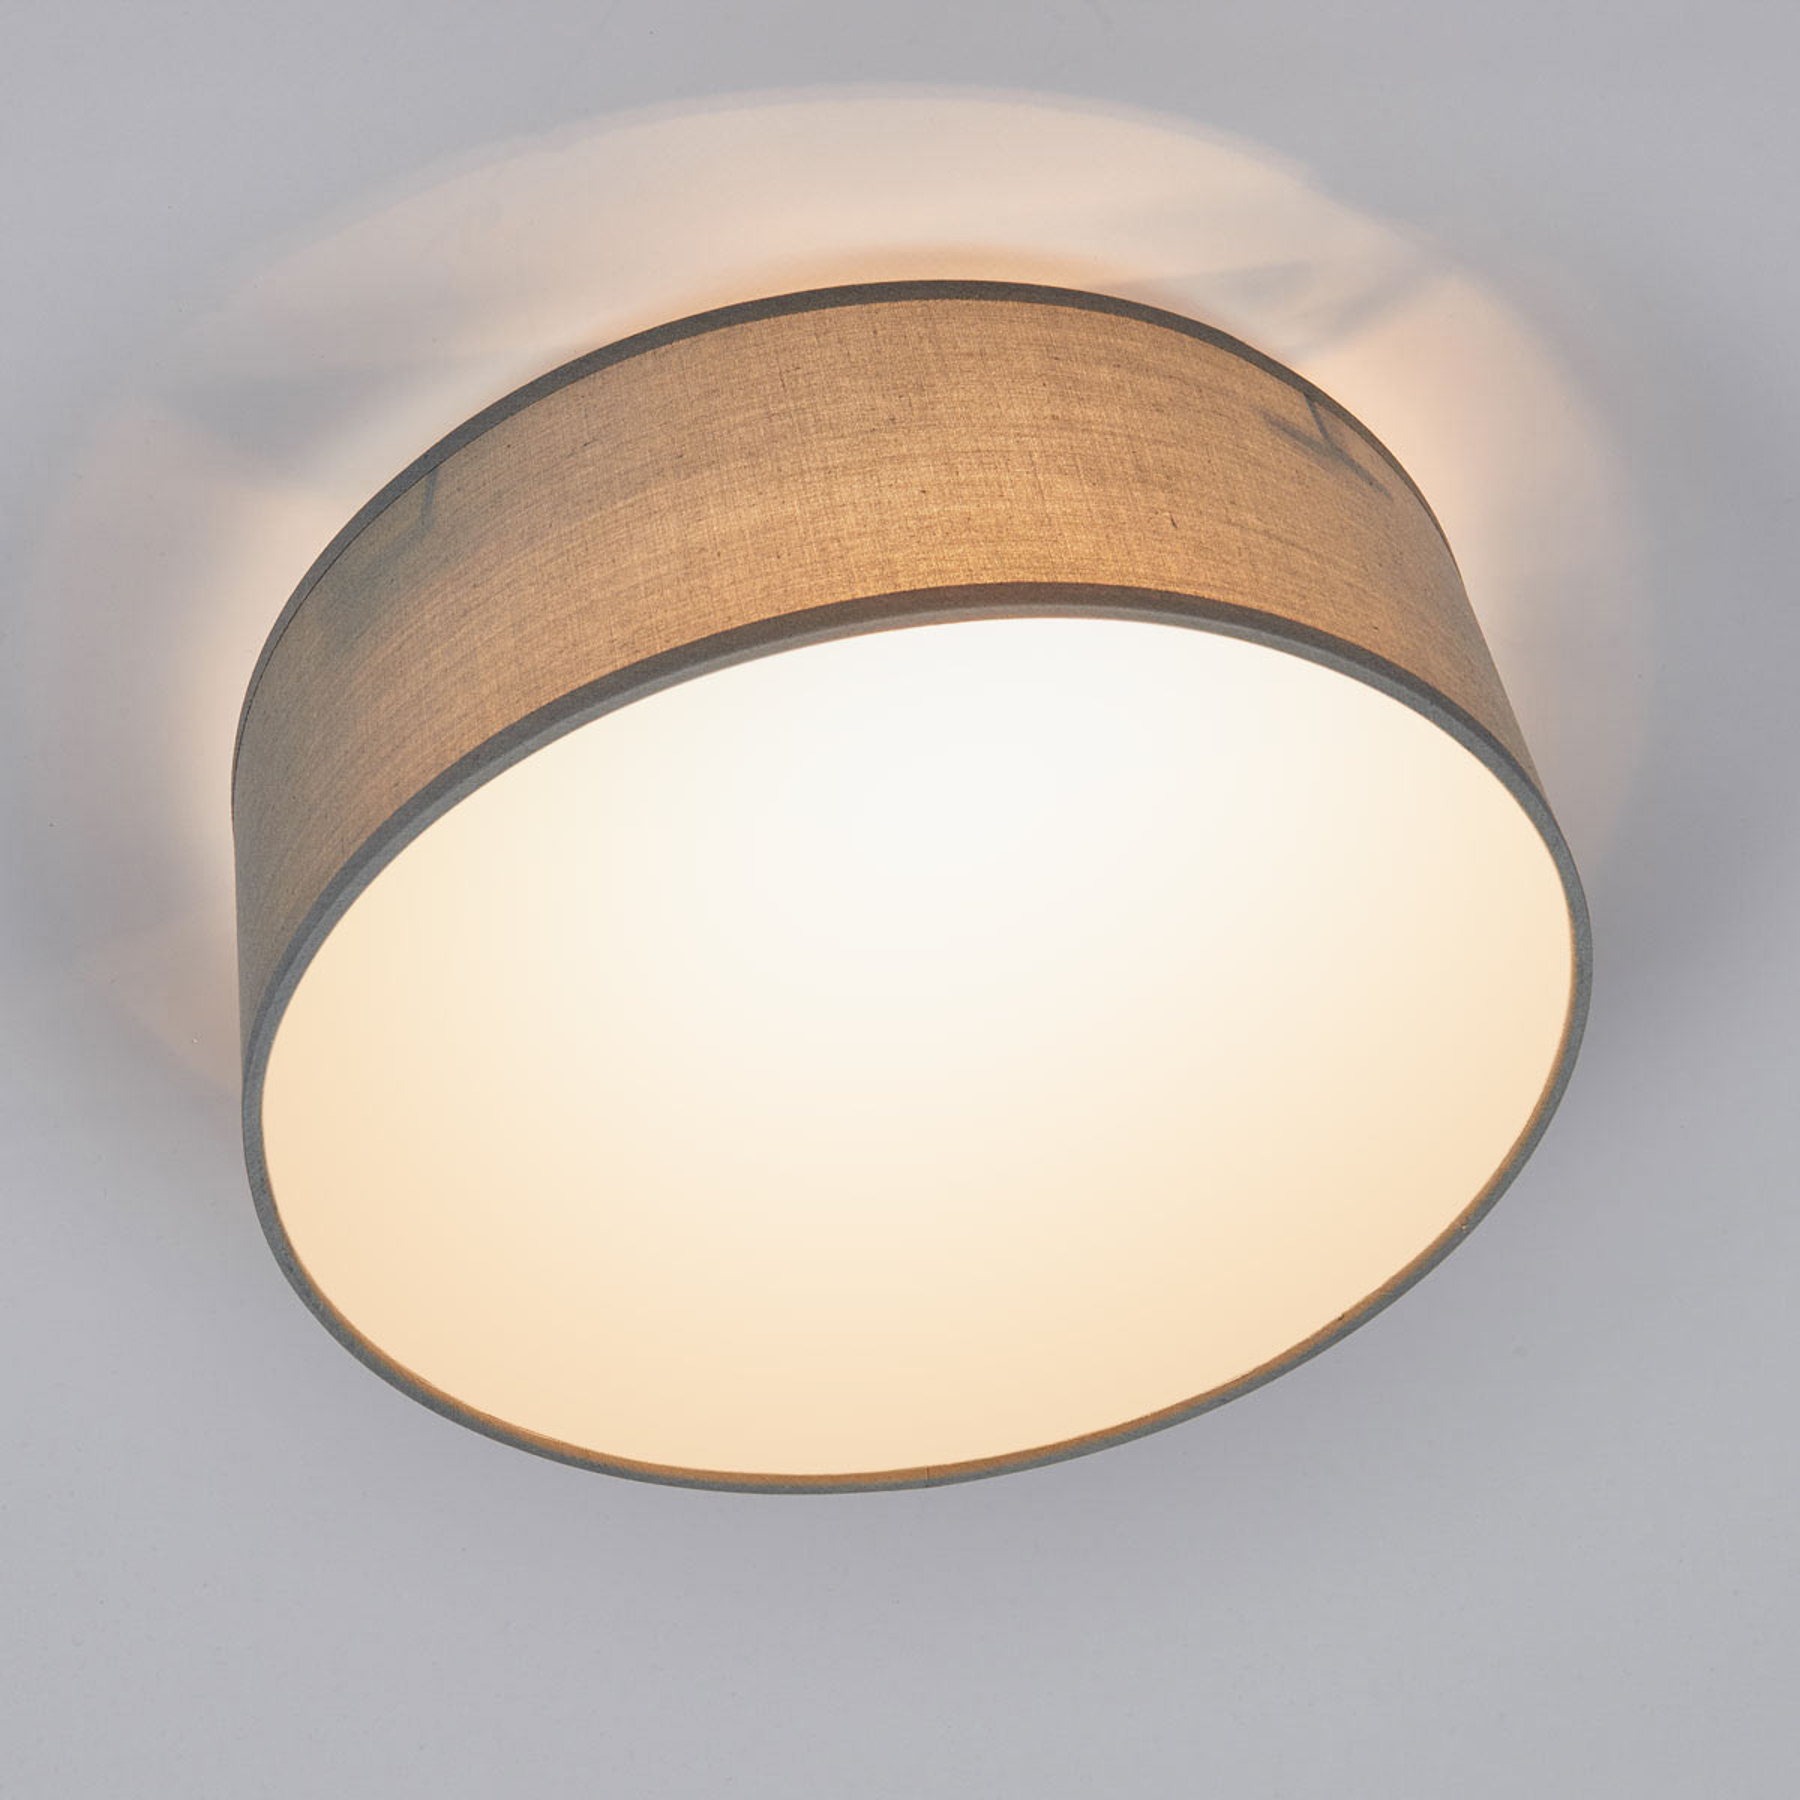 Szara lampa sufitowa CEILING DREAM, 30 cm